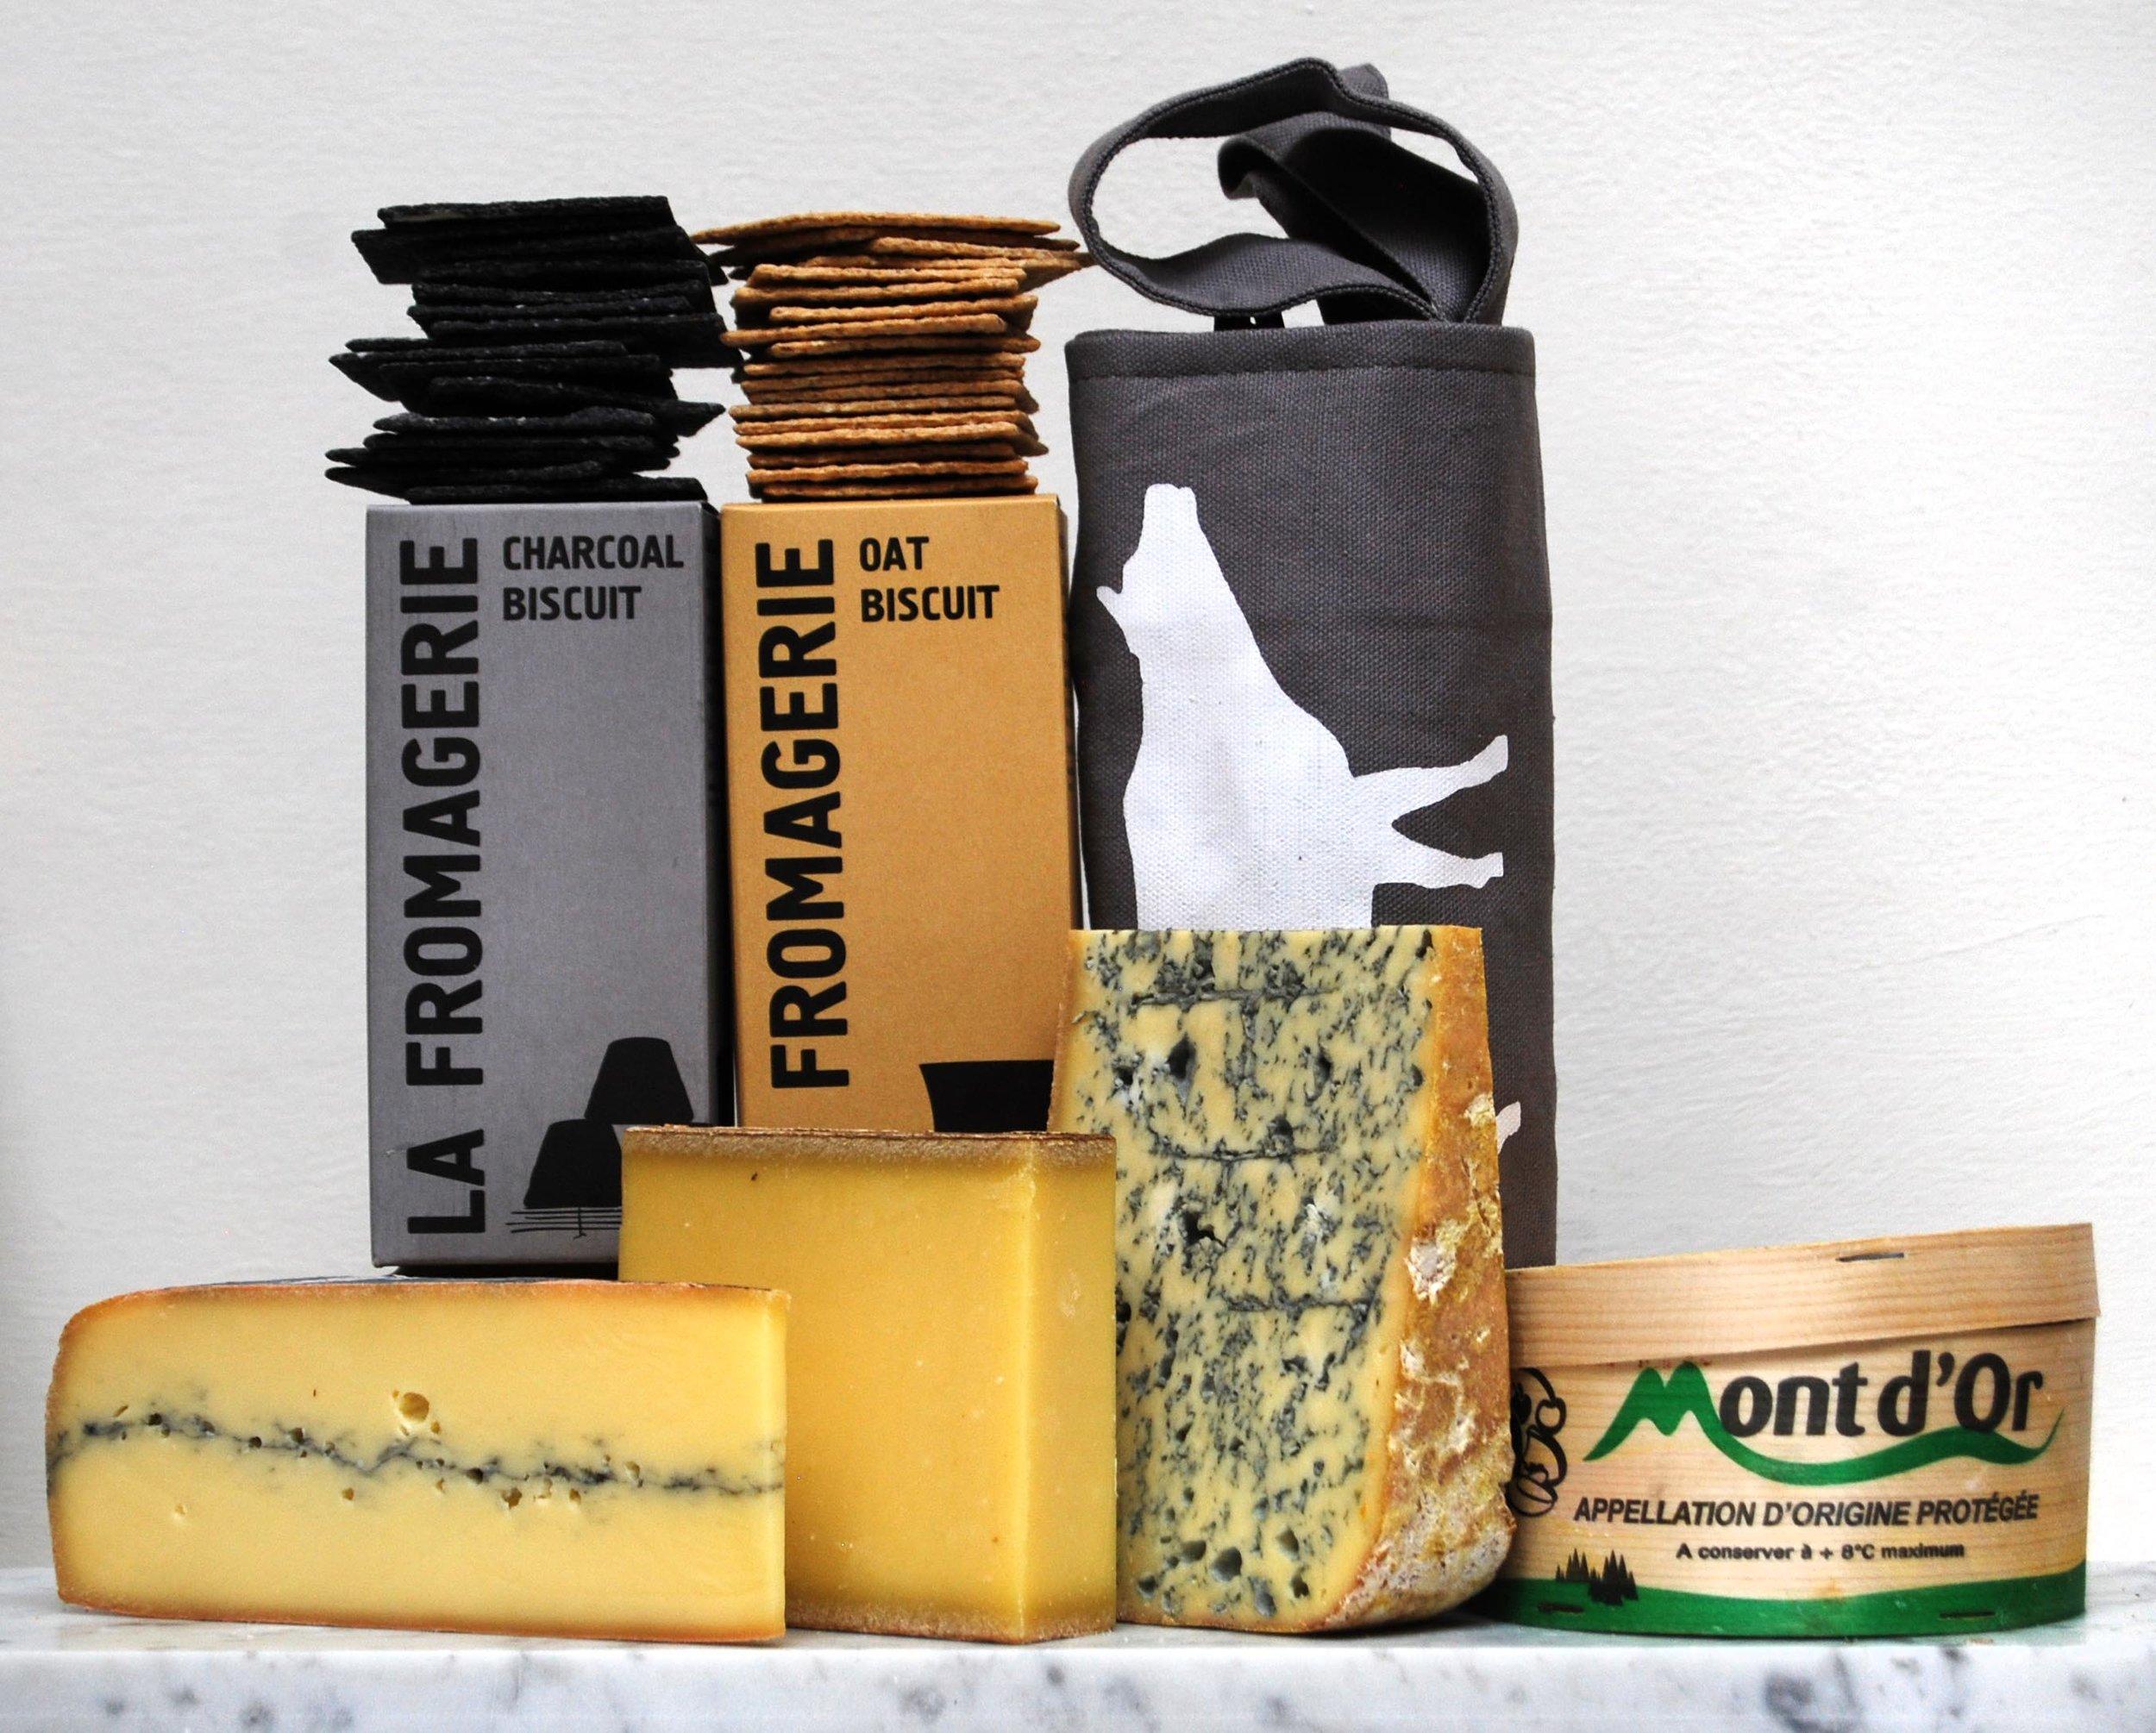 FRANCHE-COMTE GIFT BOX